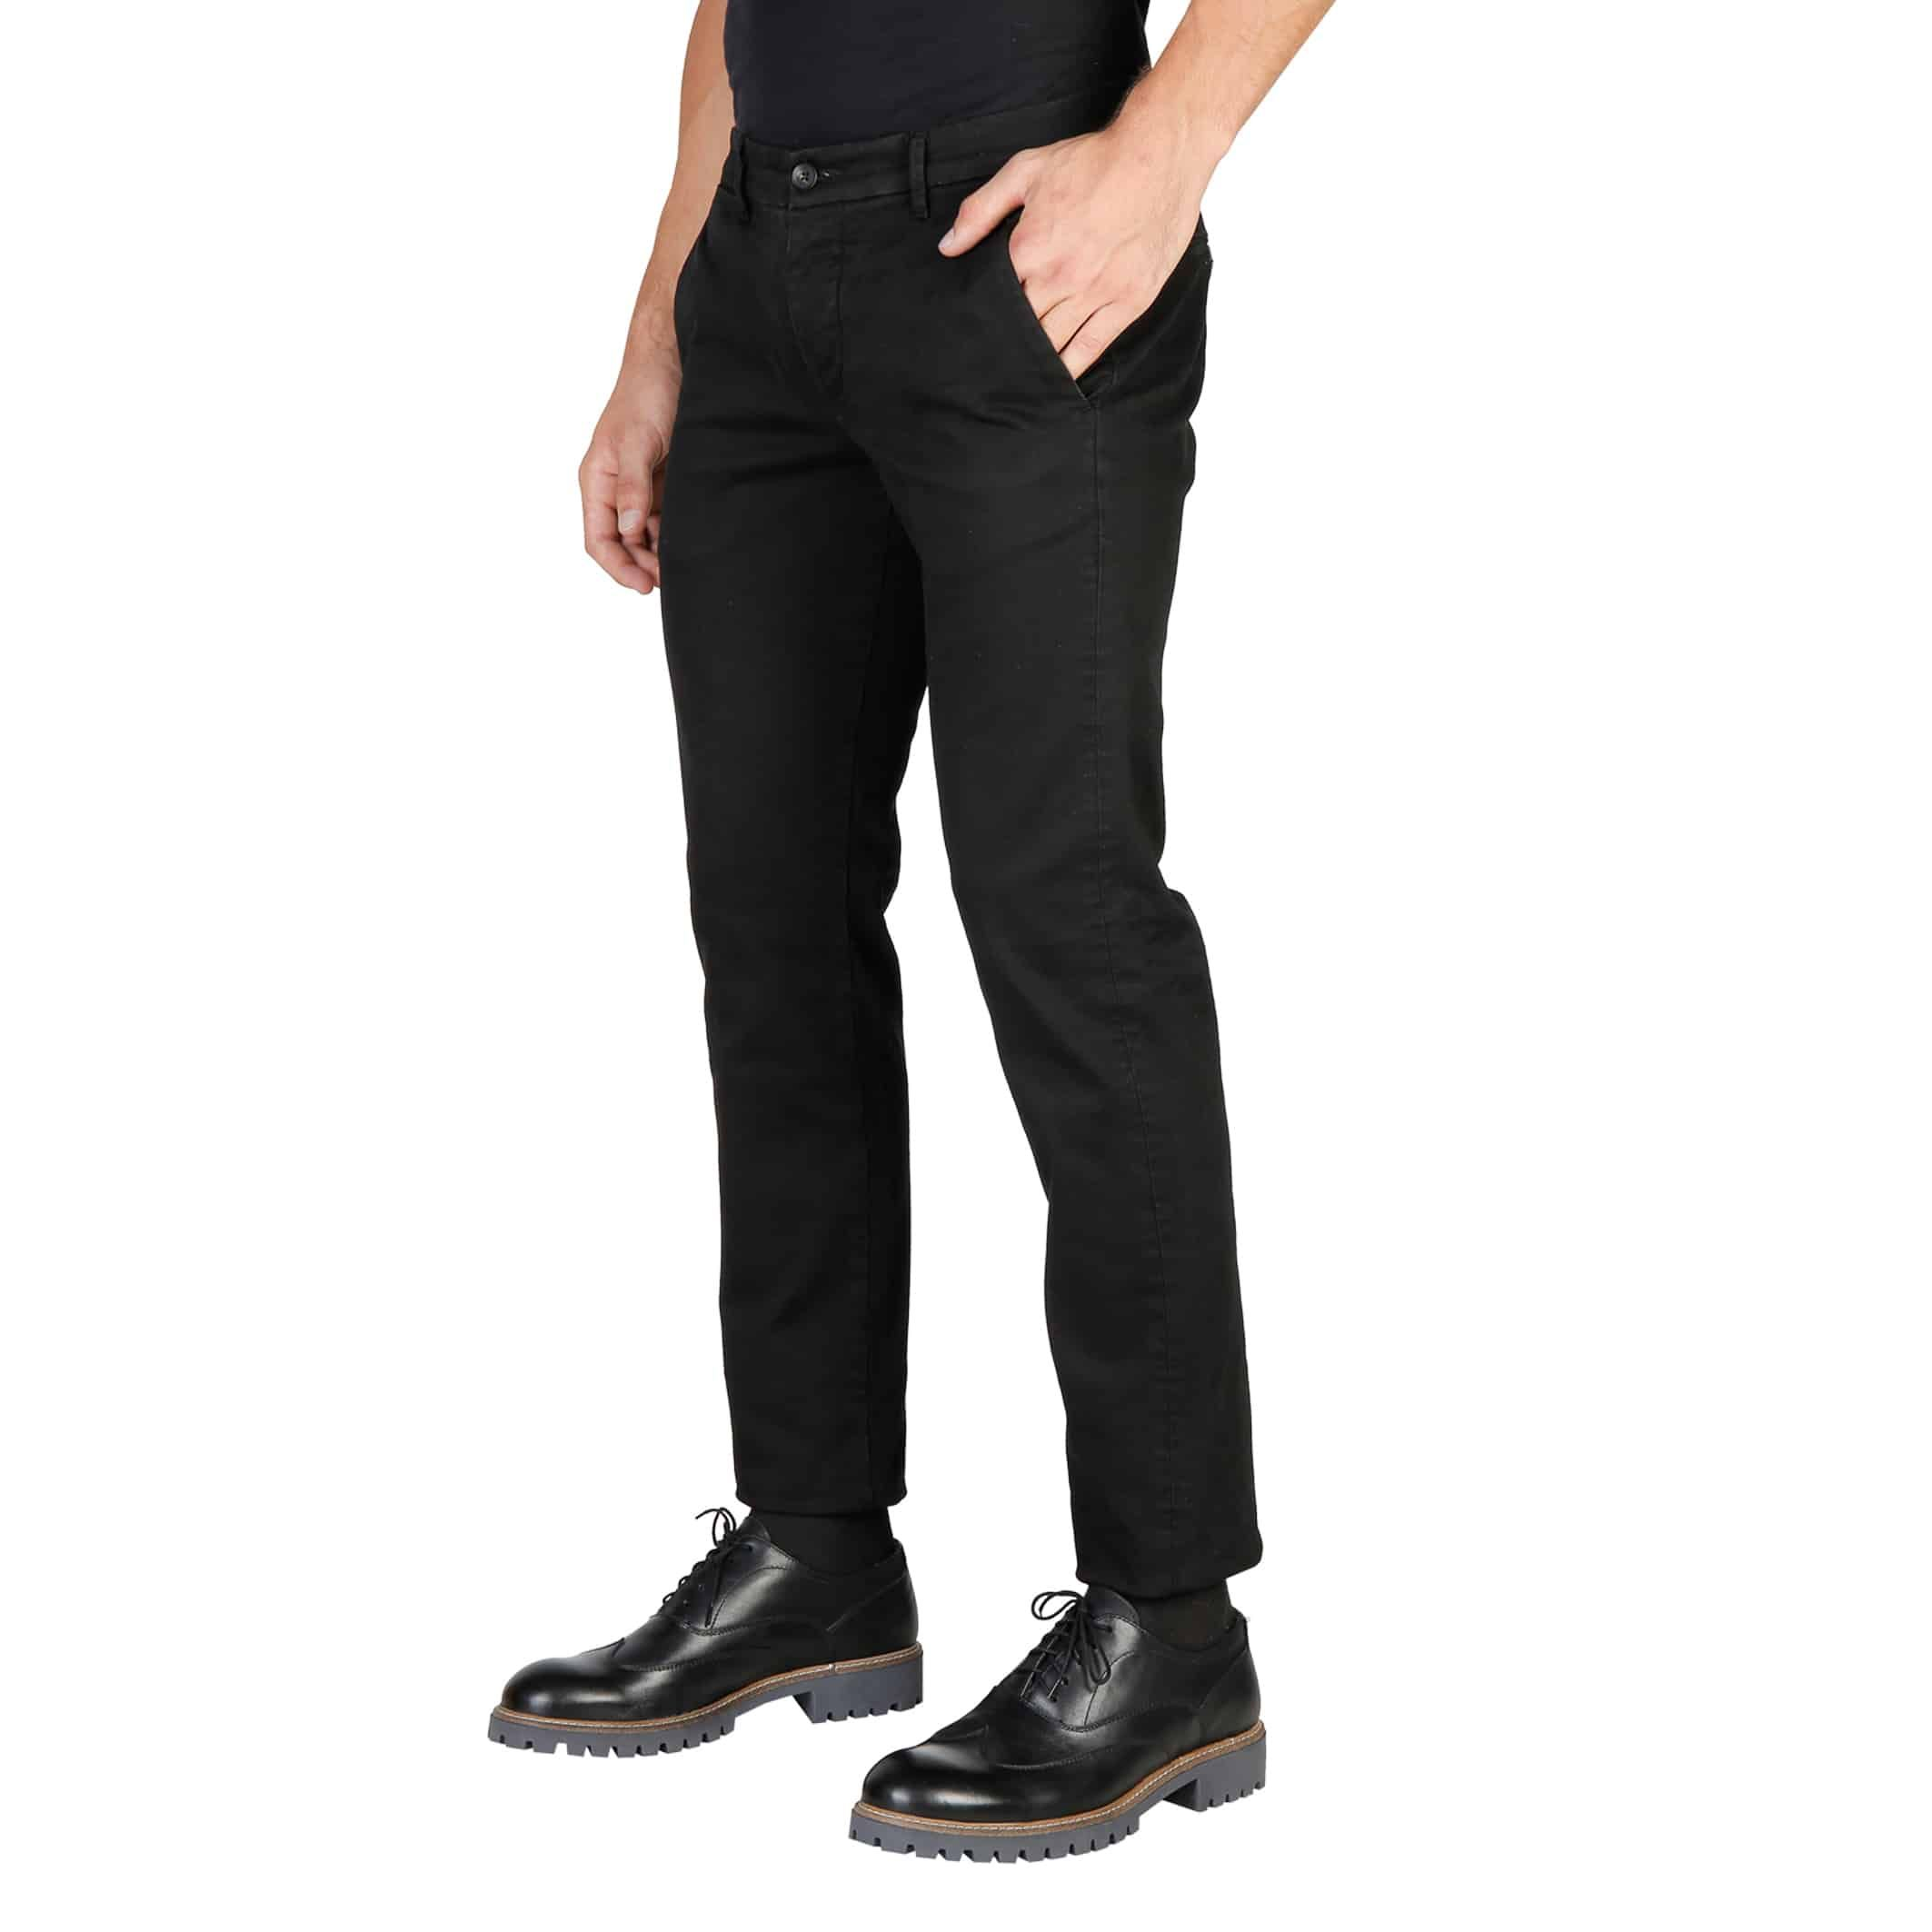 Pantalons Oxford University – OXFORD_PANT-REGULAR